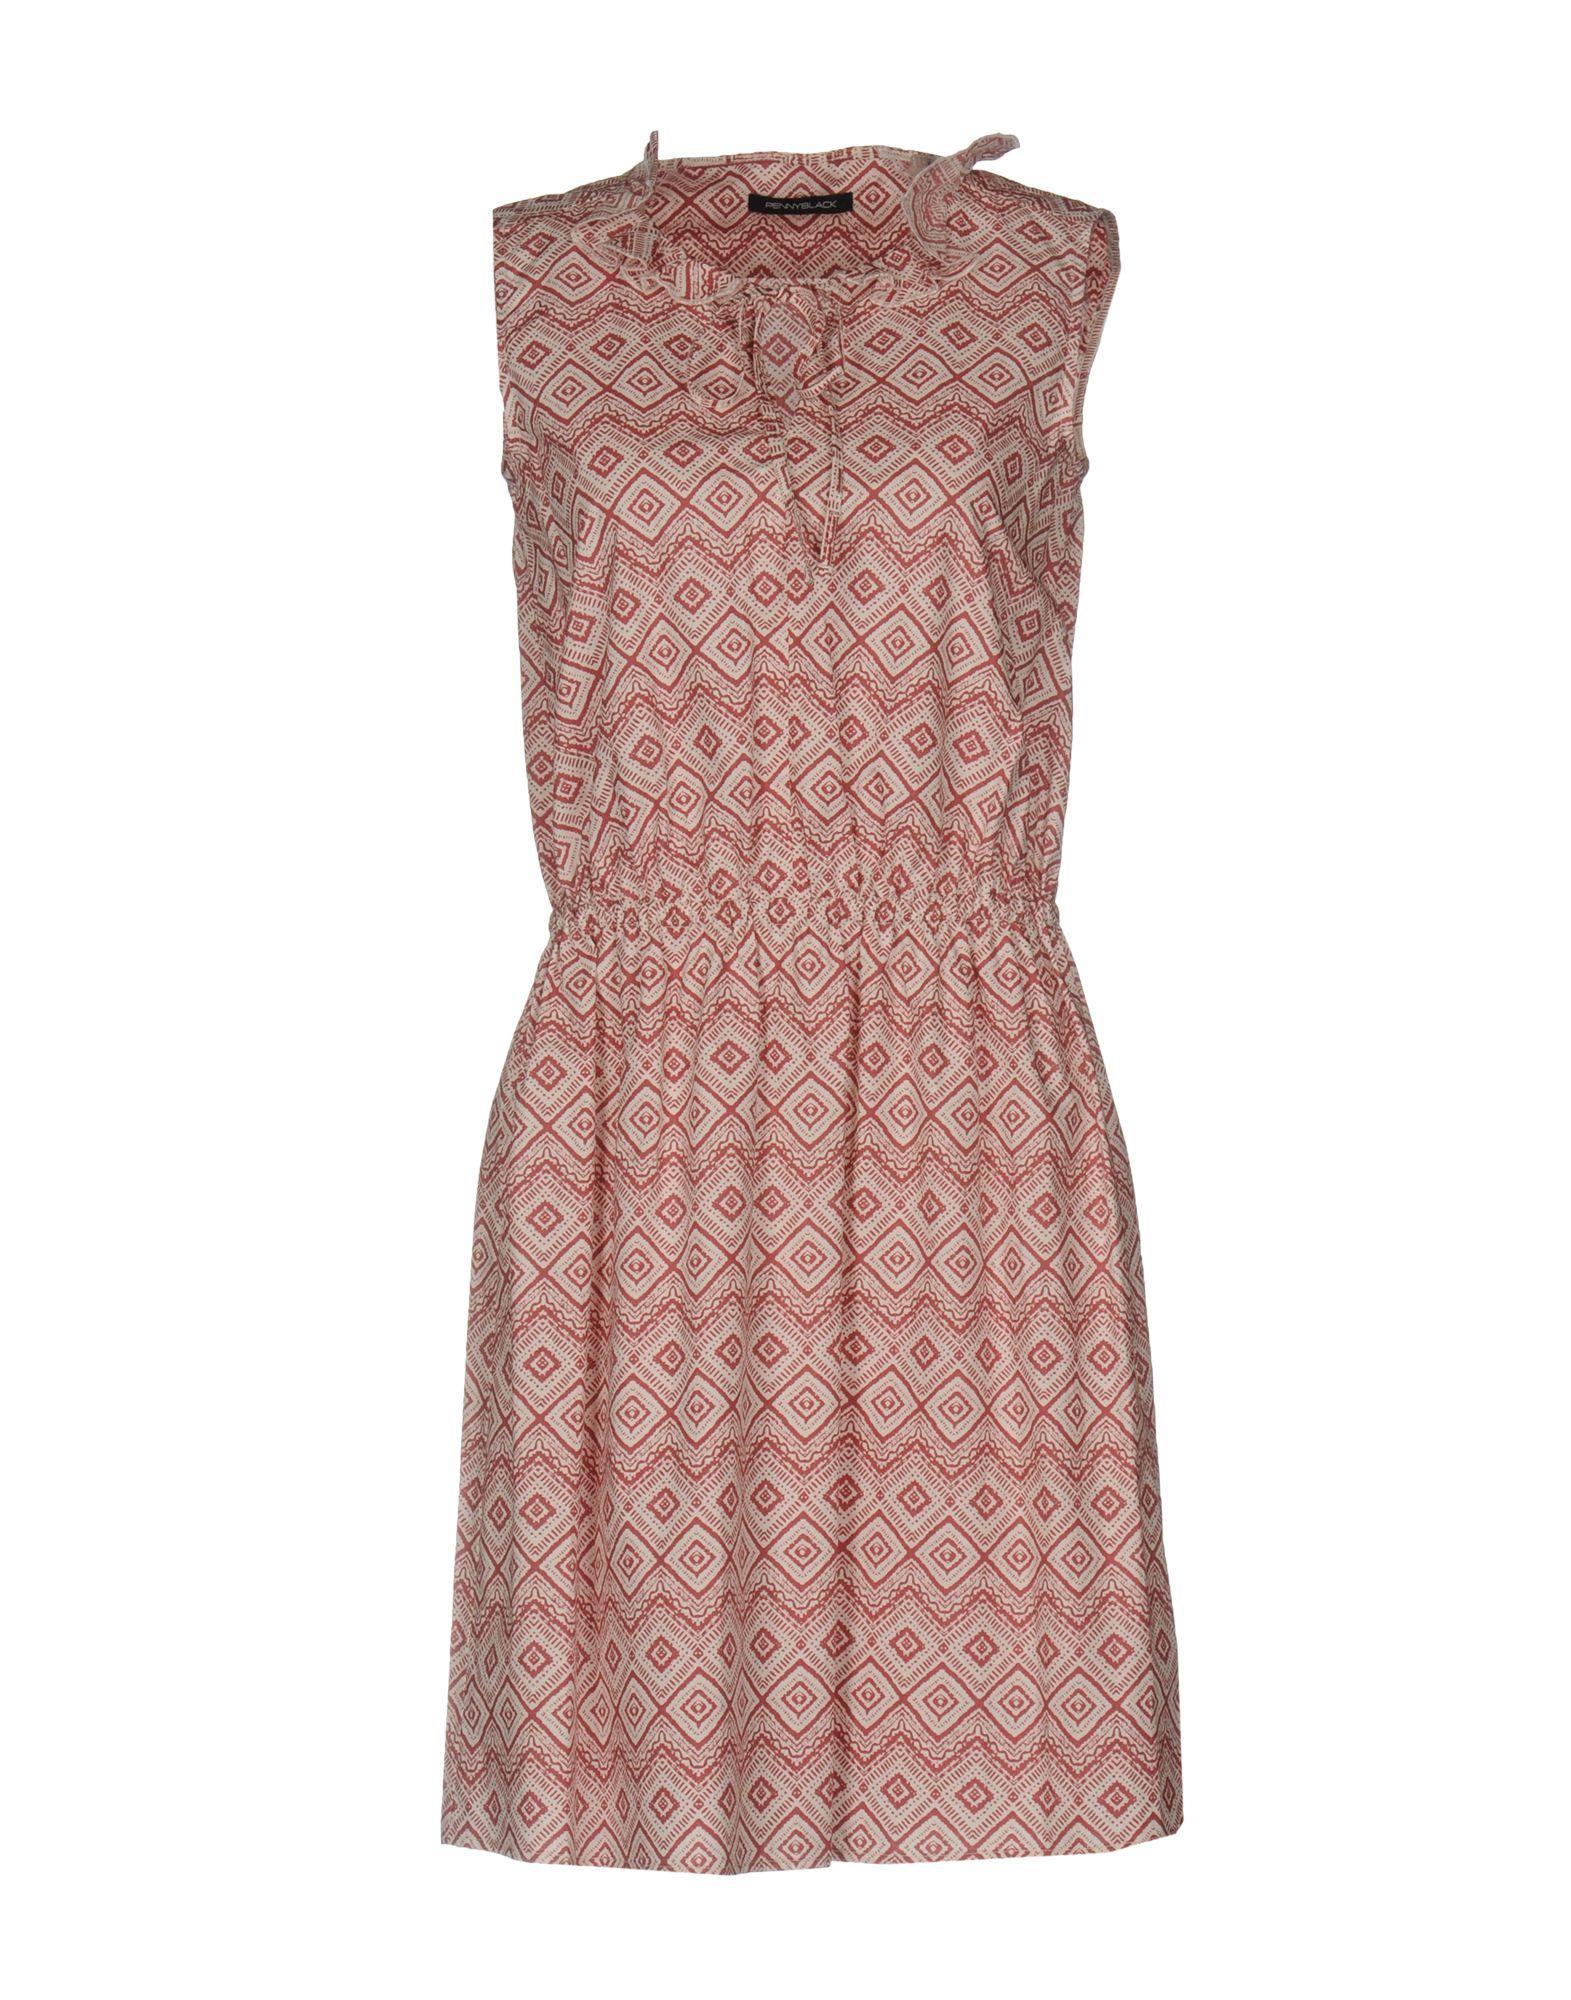 PENNYBLACK Damen Kurzes Kleid Farbe Purpur Größe 6